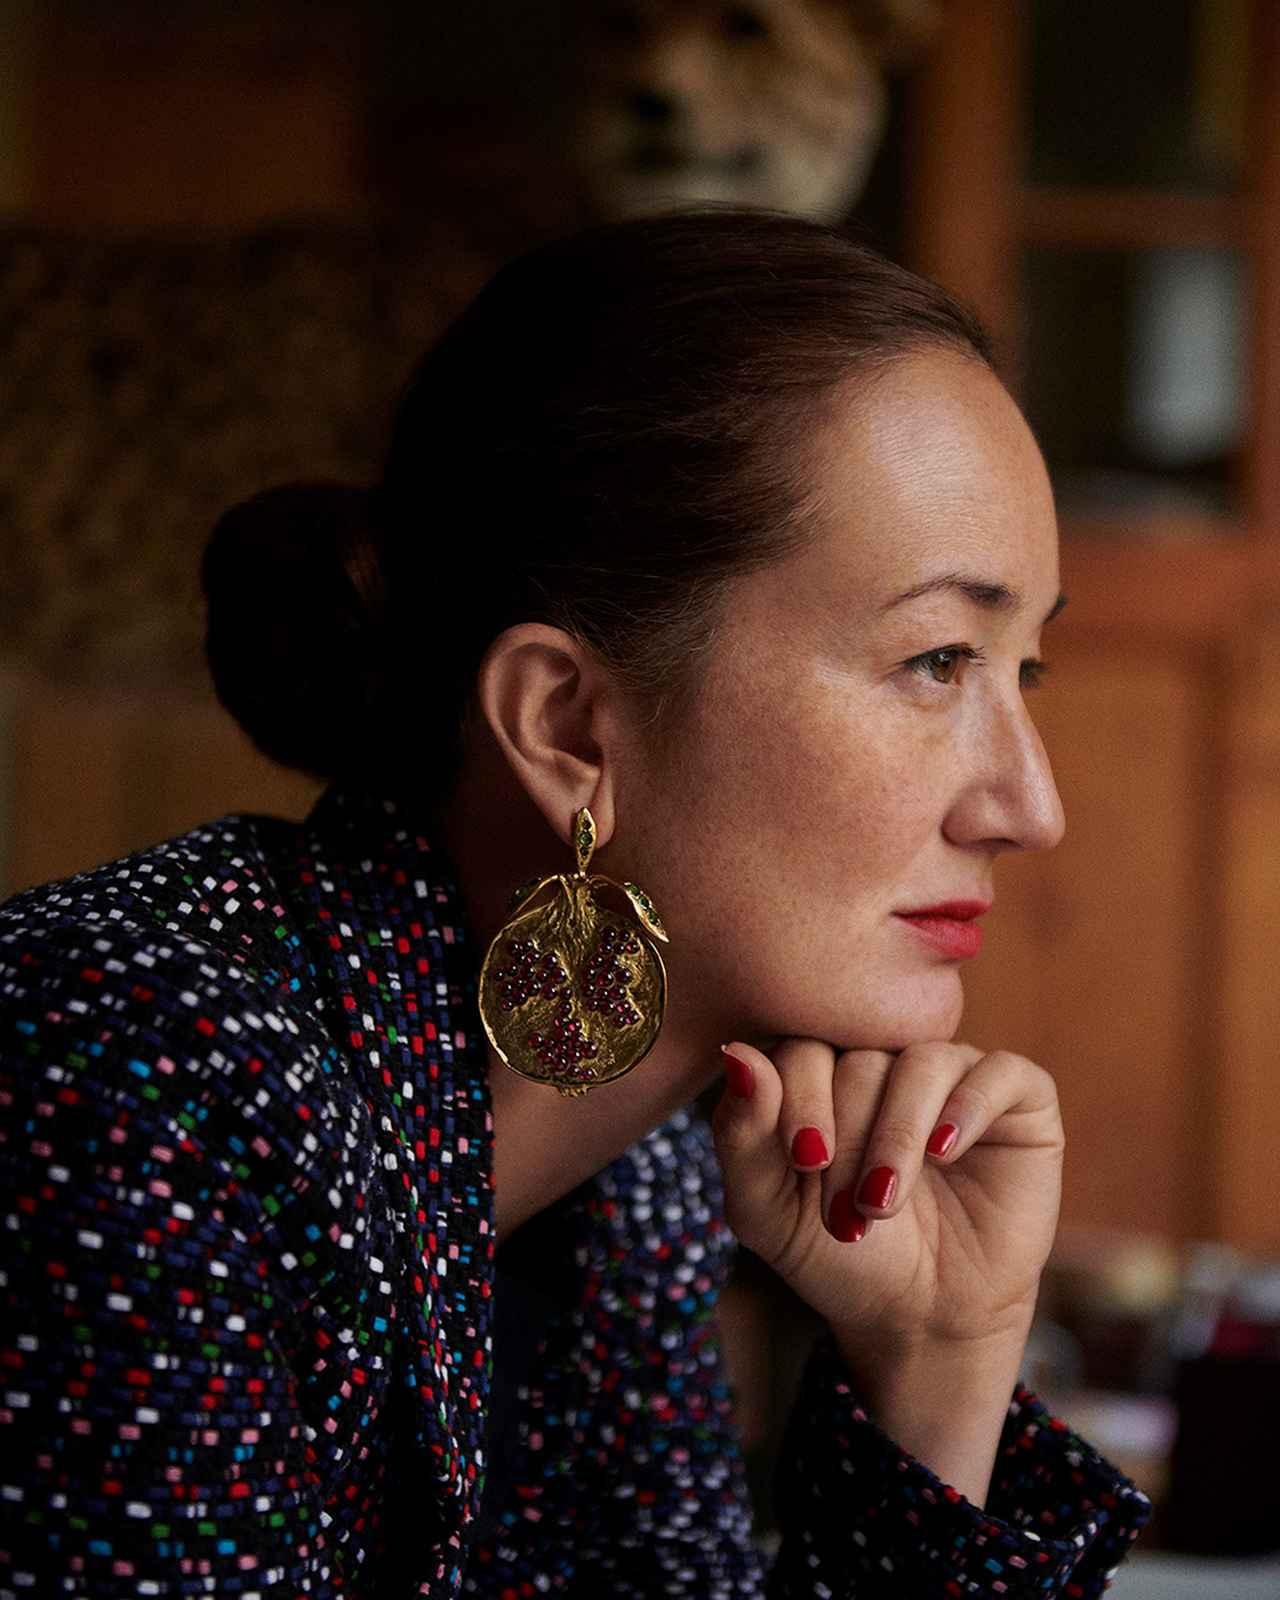 Images : Harumi Klossowska de Rola(ハルミ・クロソフスカ・ド・ローラ)